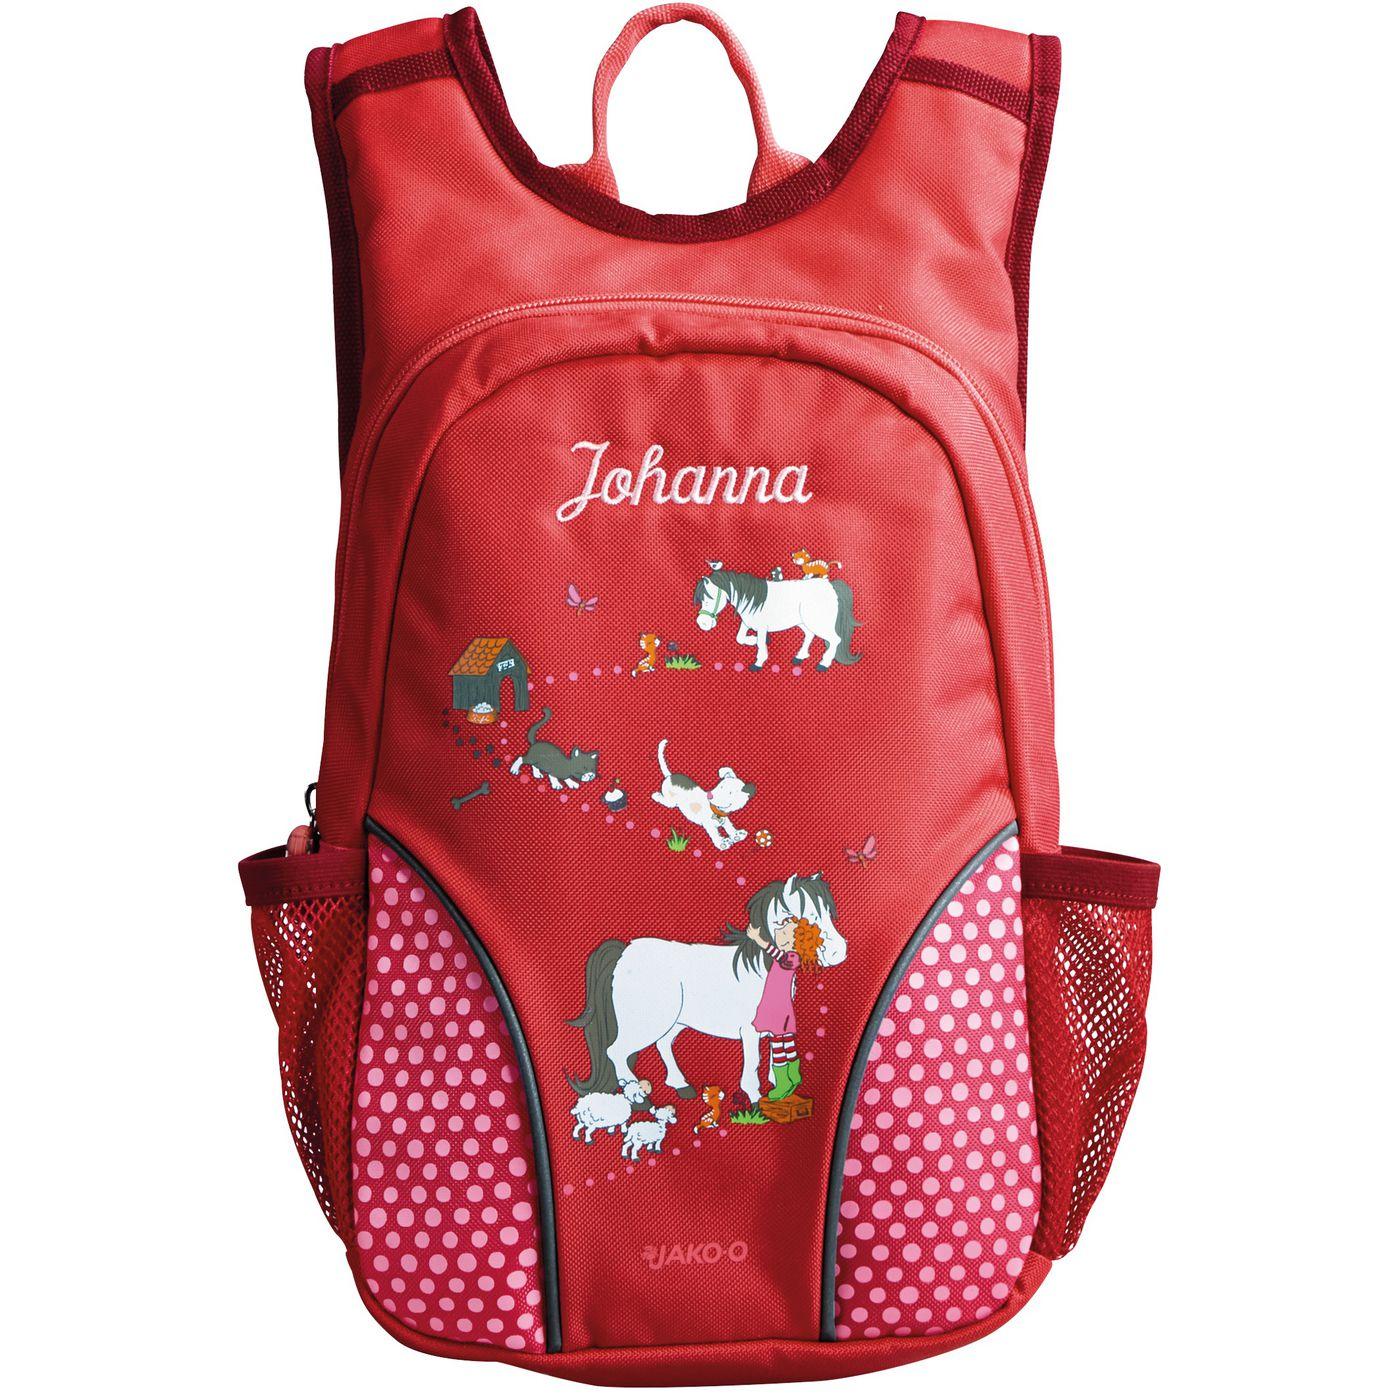 Kita-рюкзак с именем JAKO‑O